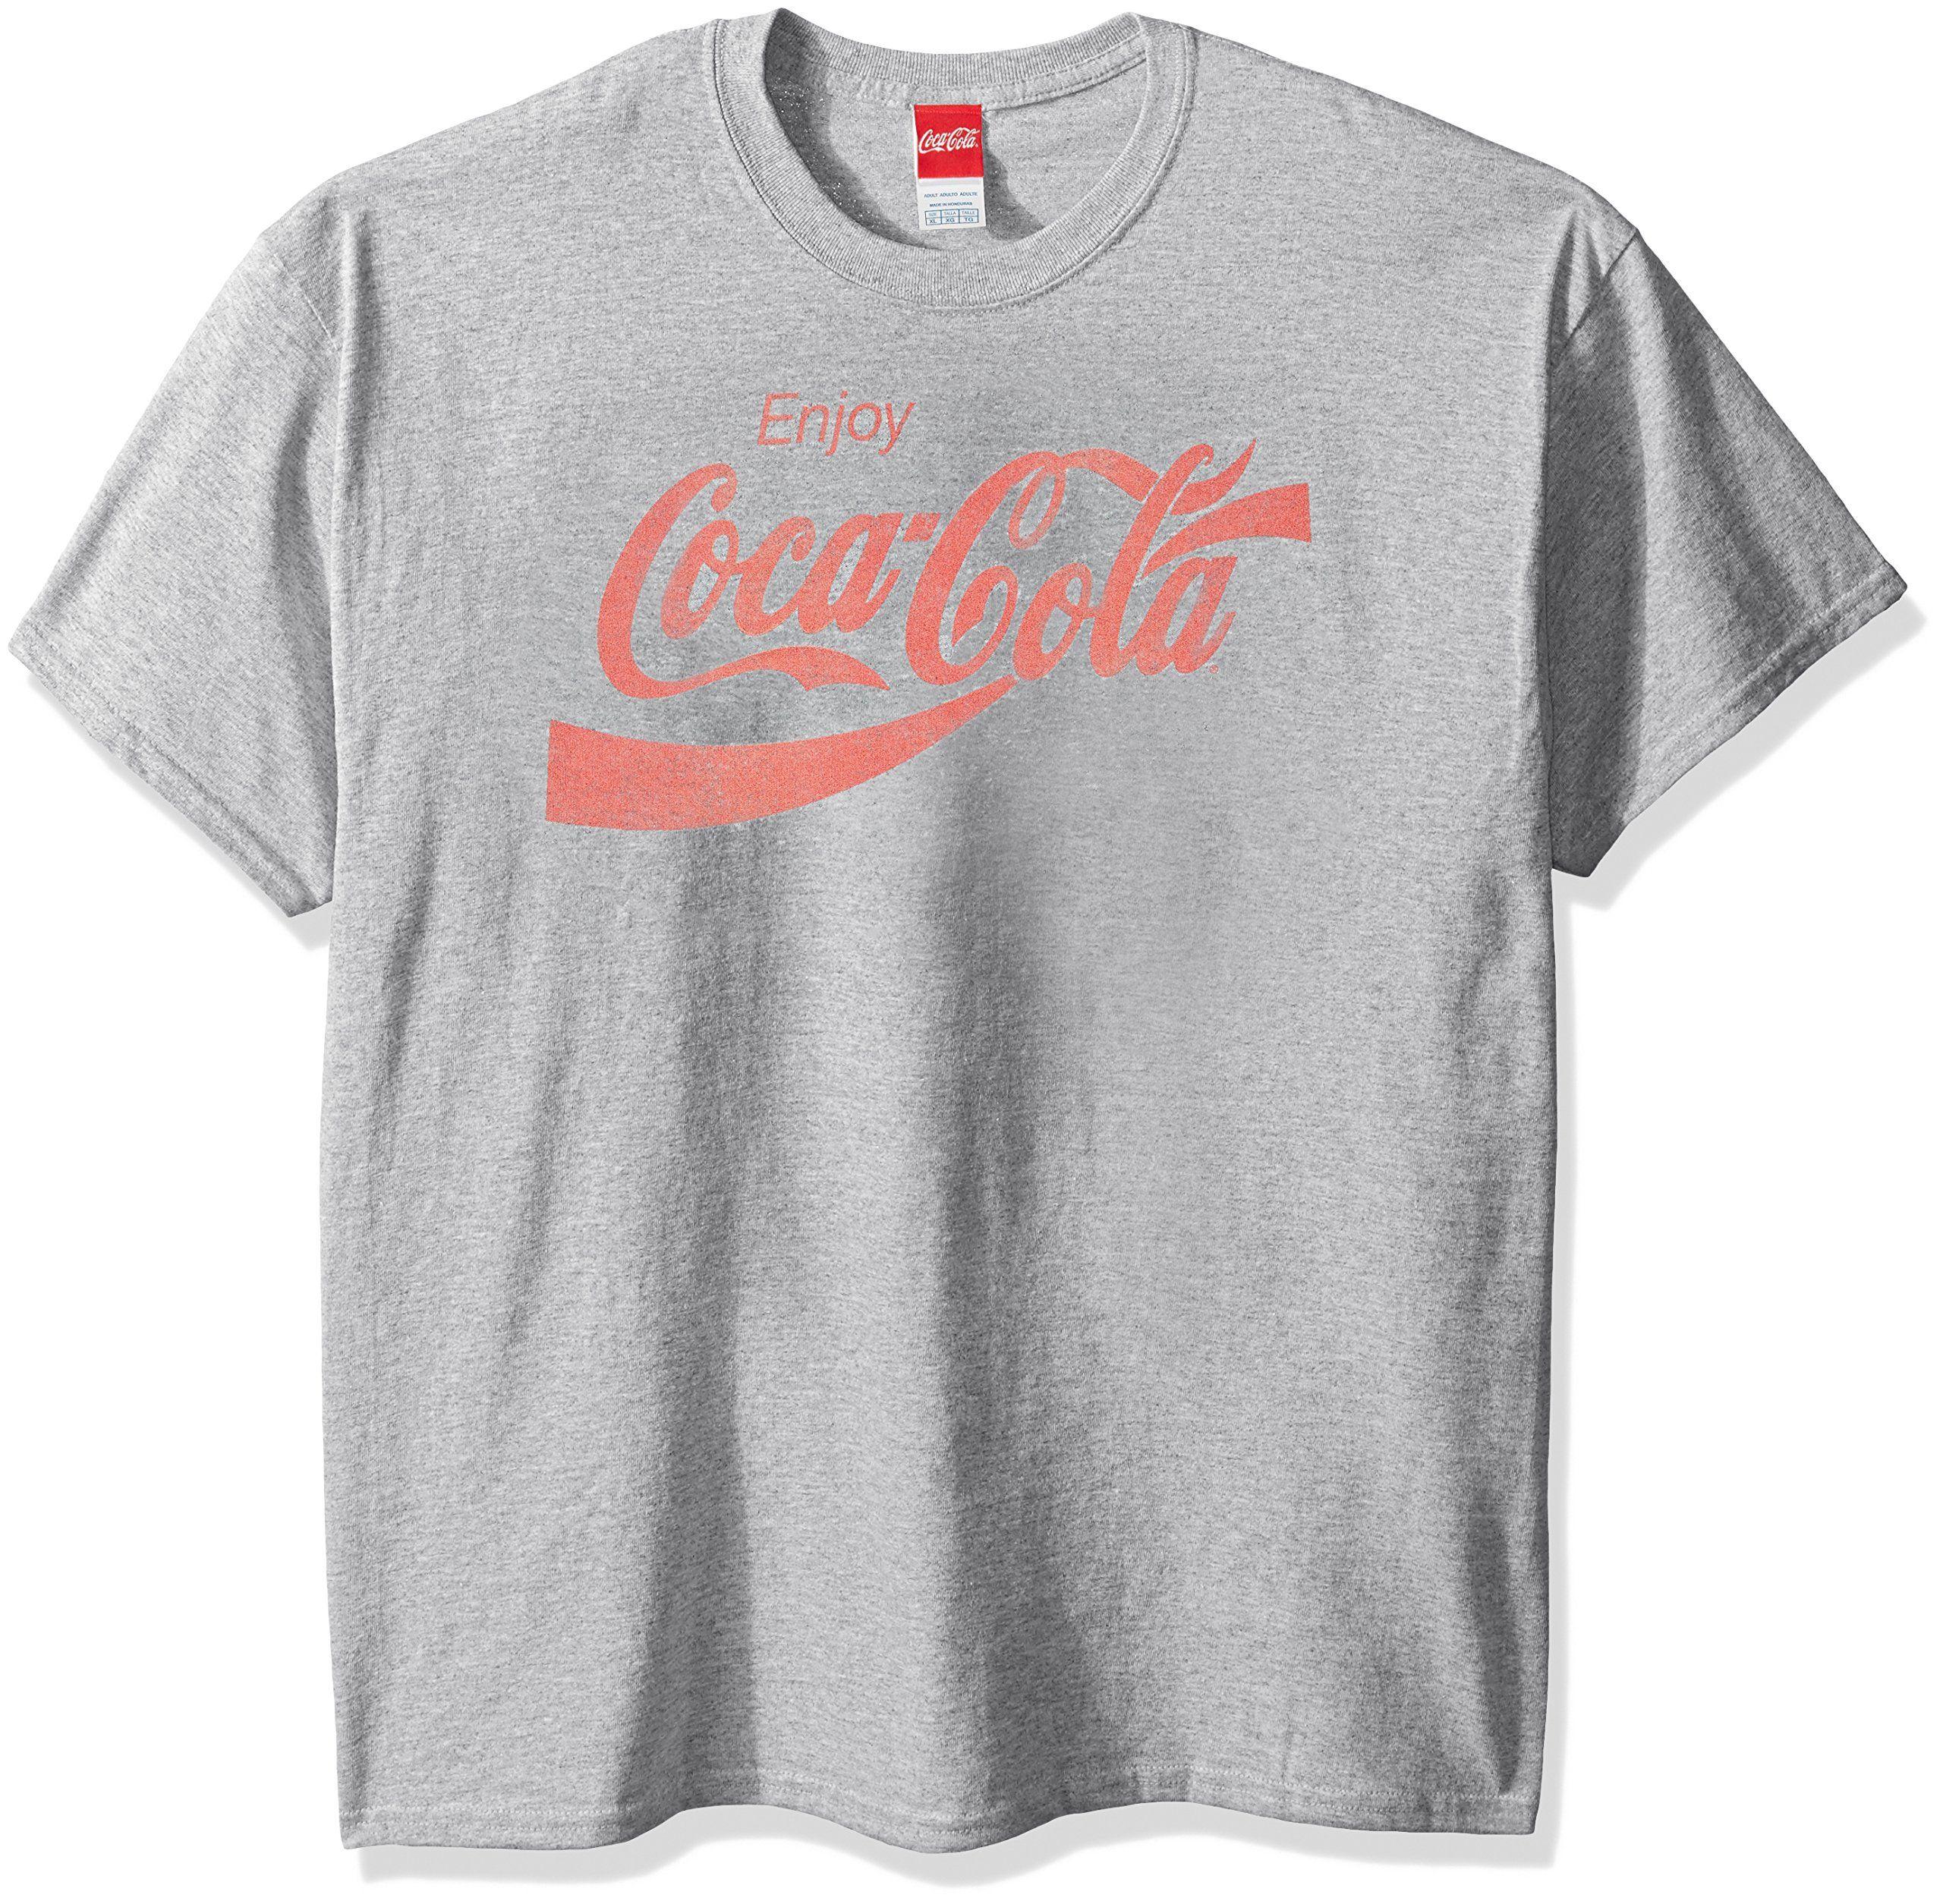 New Coca-Cola Enjoy Coke Logo Mens Heather Red Classic Vintage T-Shirt